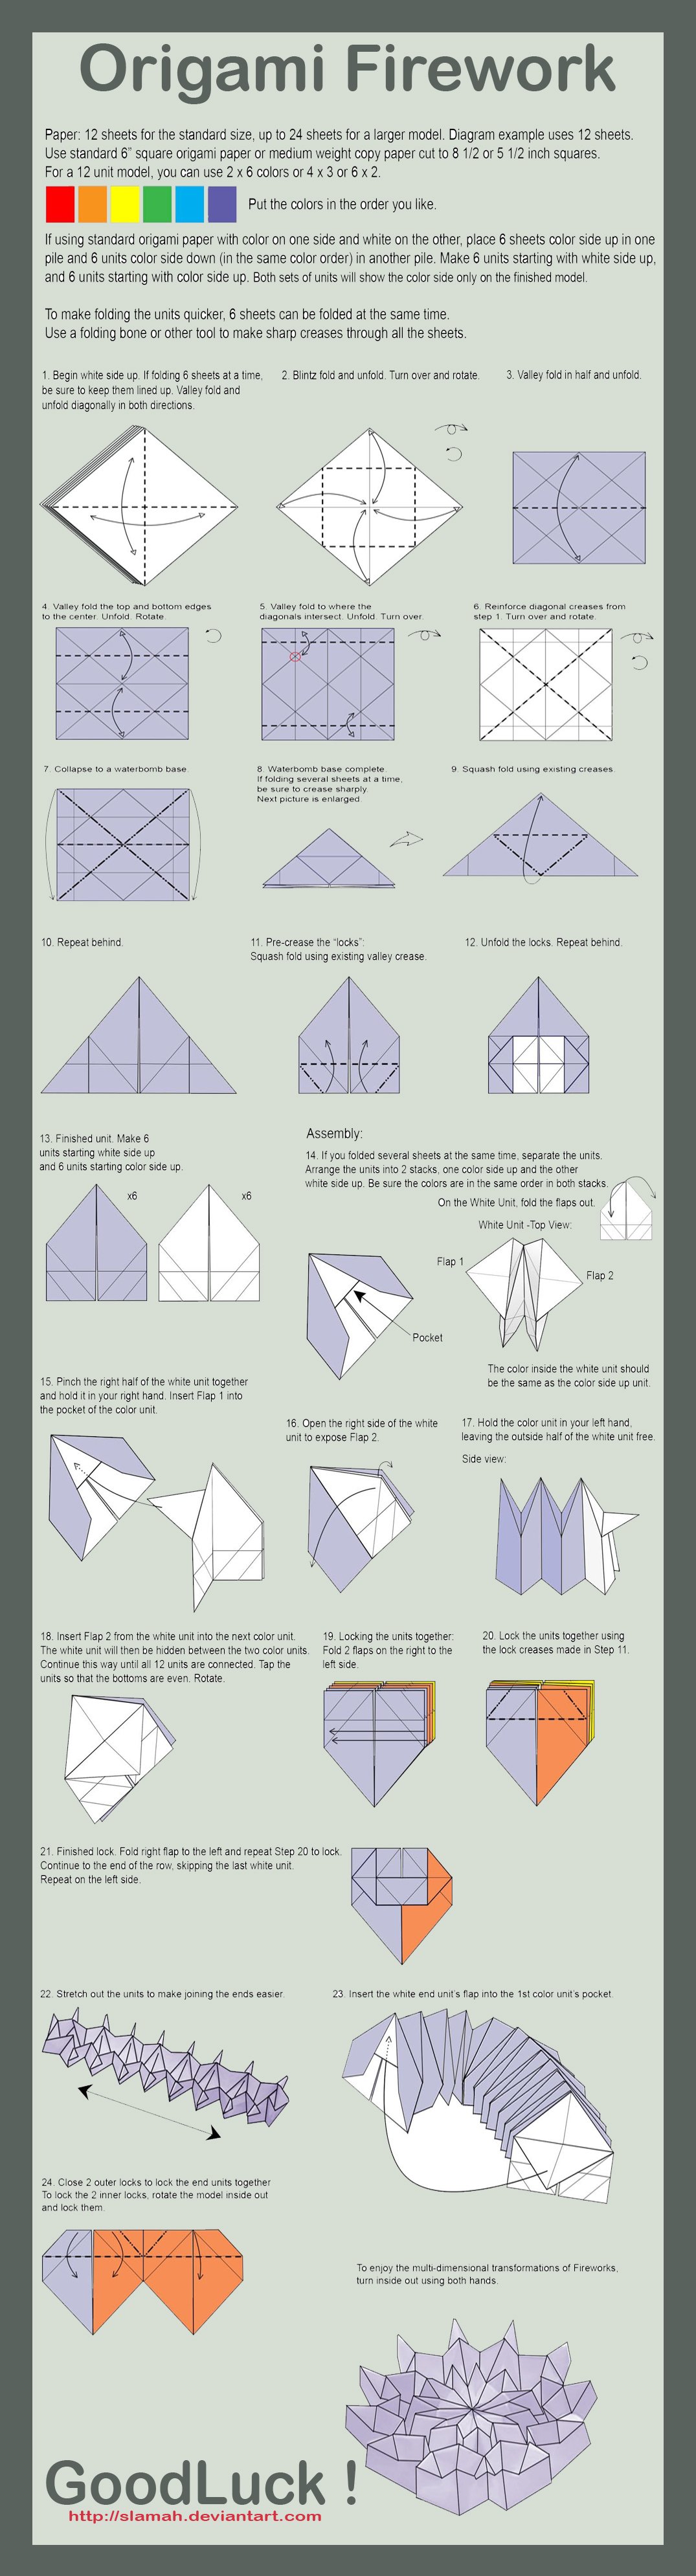 Origami Firework Folding Instructions Instruction Diagram